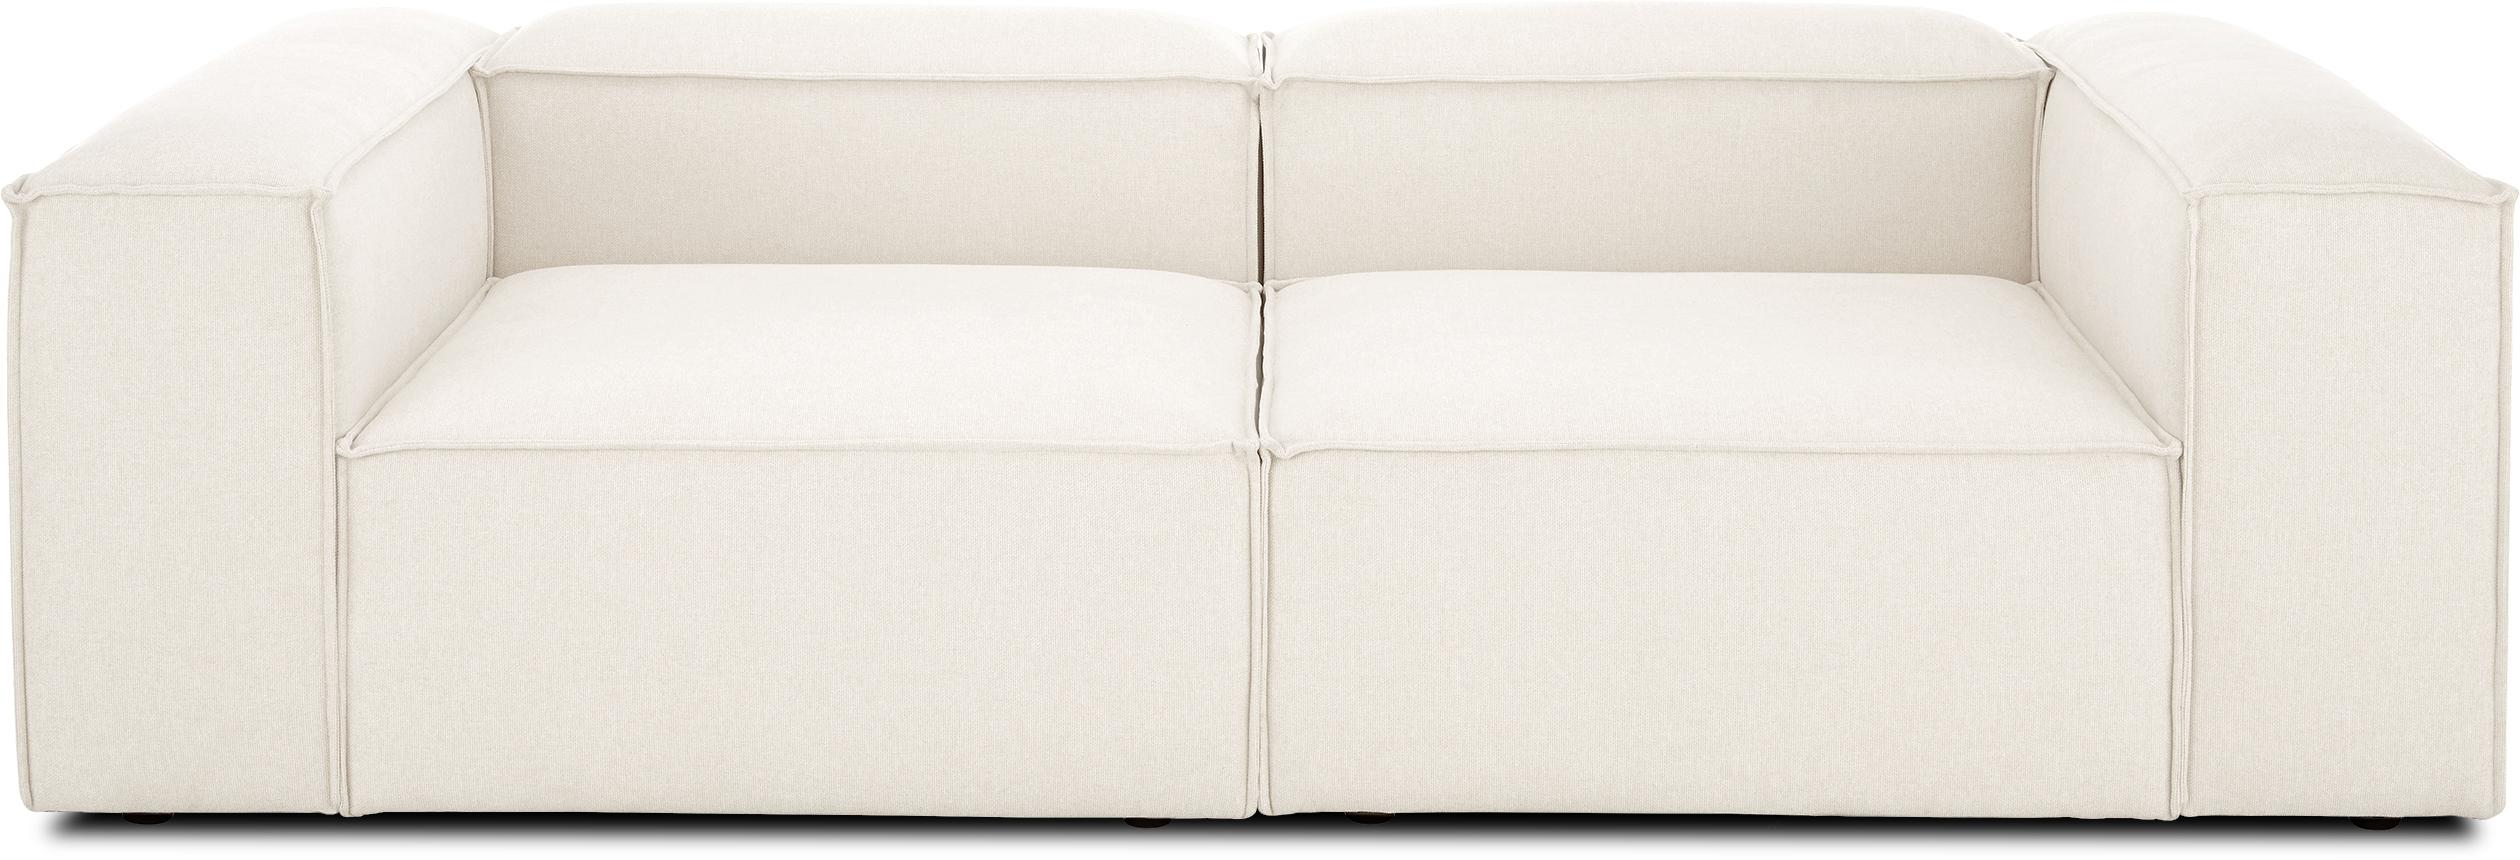 Modulares Sofa Lennon (3-Sitzer), Bezug: Polyester Der hochwertige, Gestell: Massives Kiefernholz, Spe, Webstoff Beige, B 238 x T 119 cm